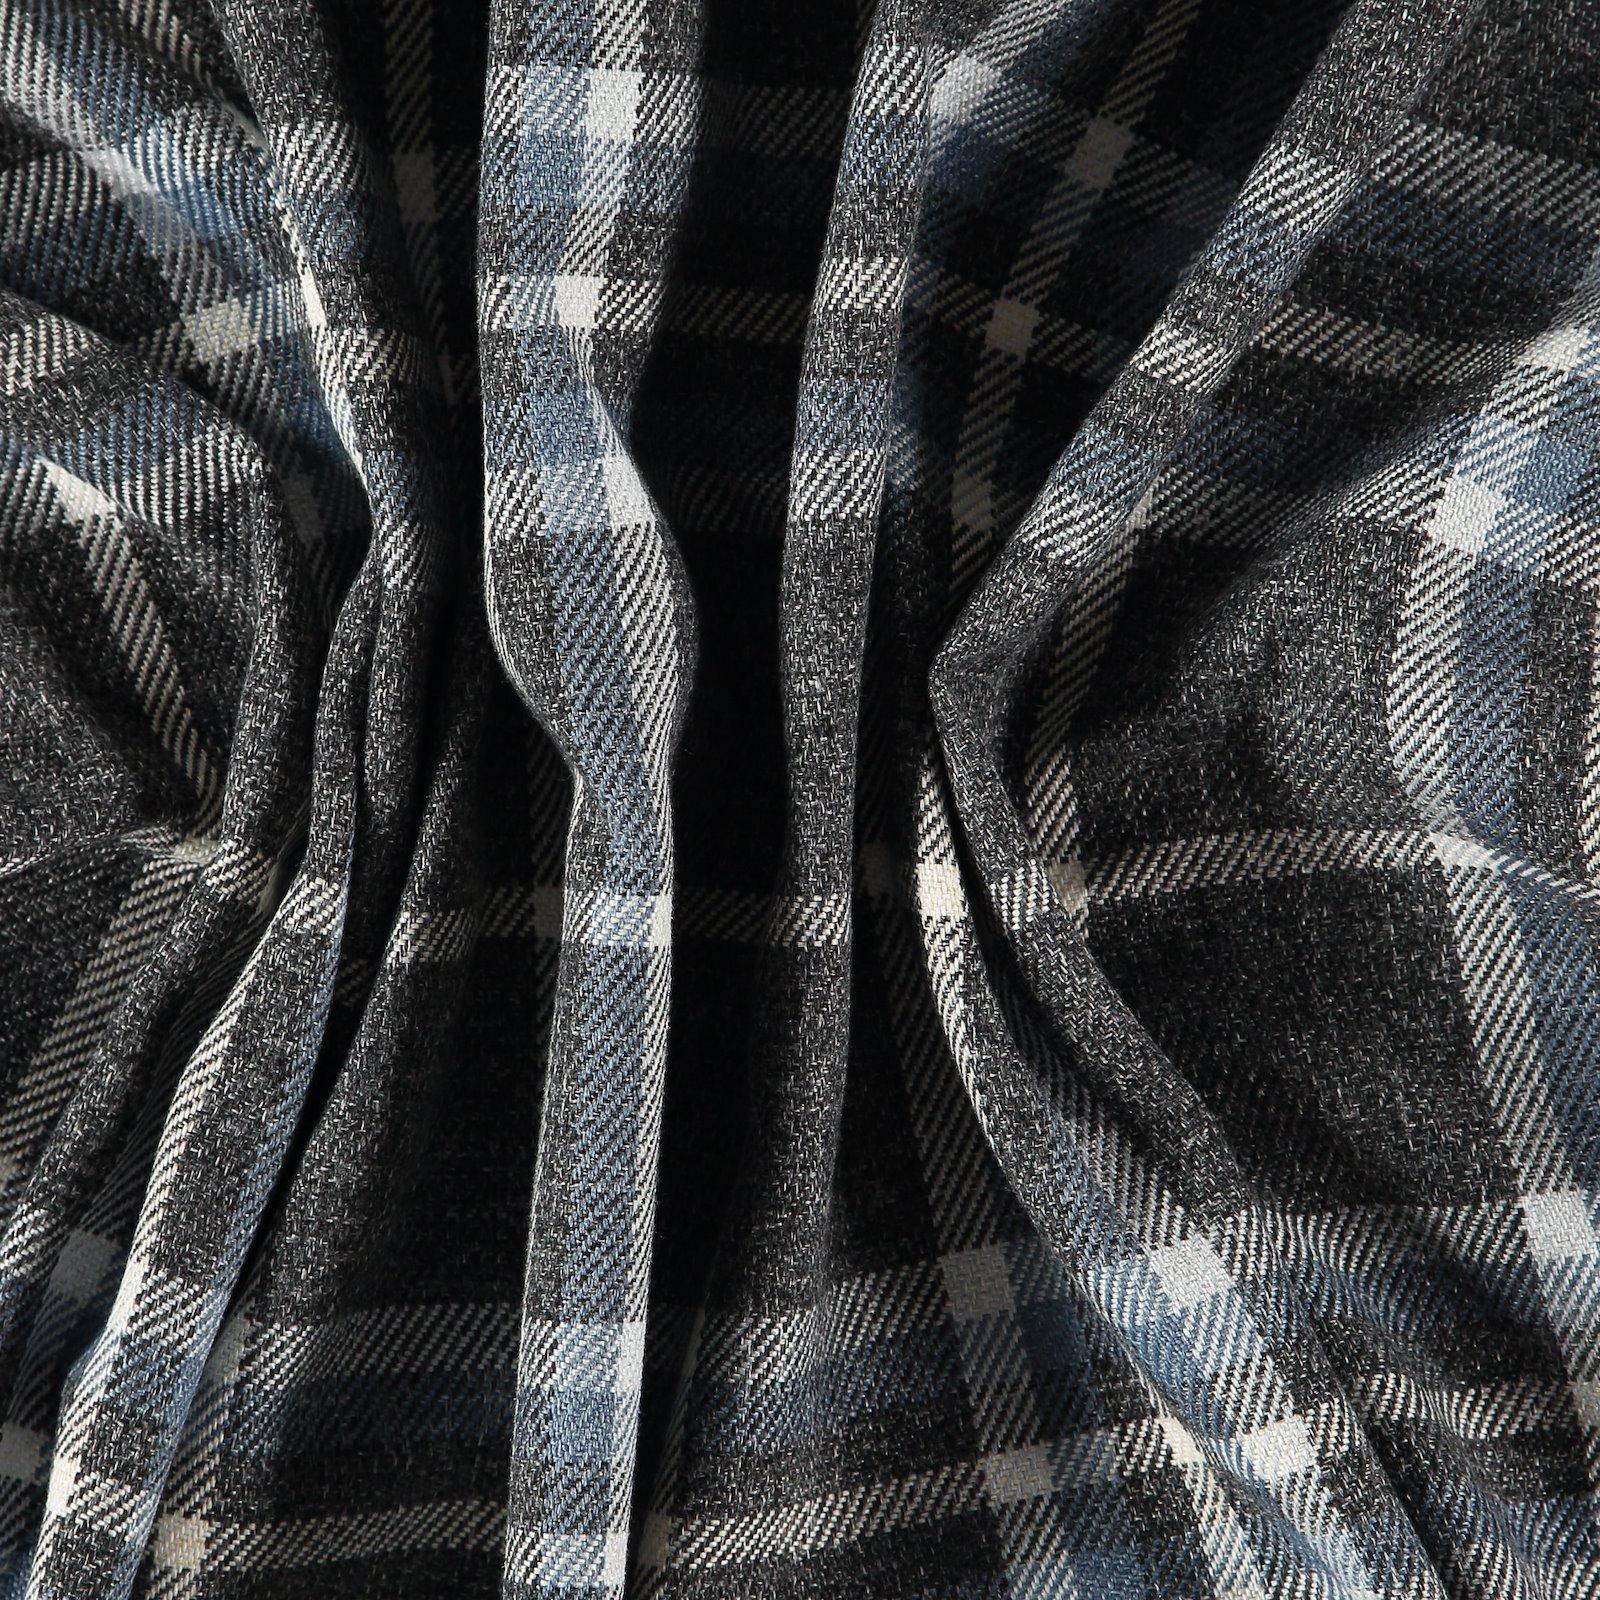 Upholstery wool look grey/blue checks